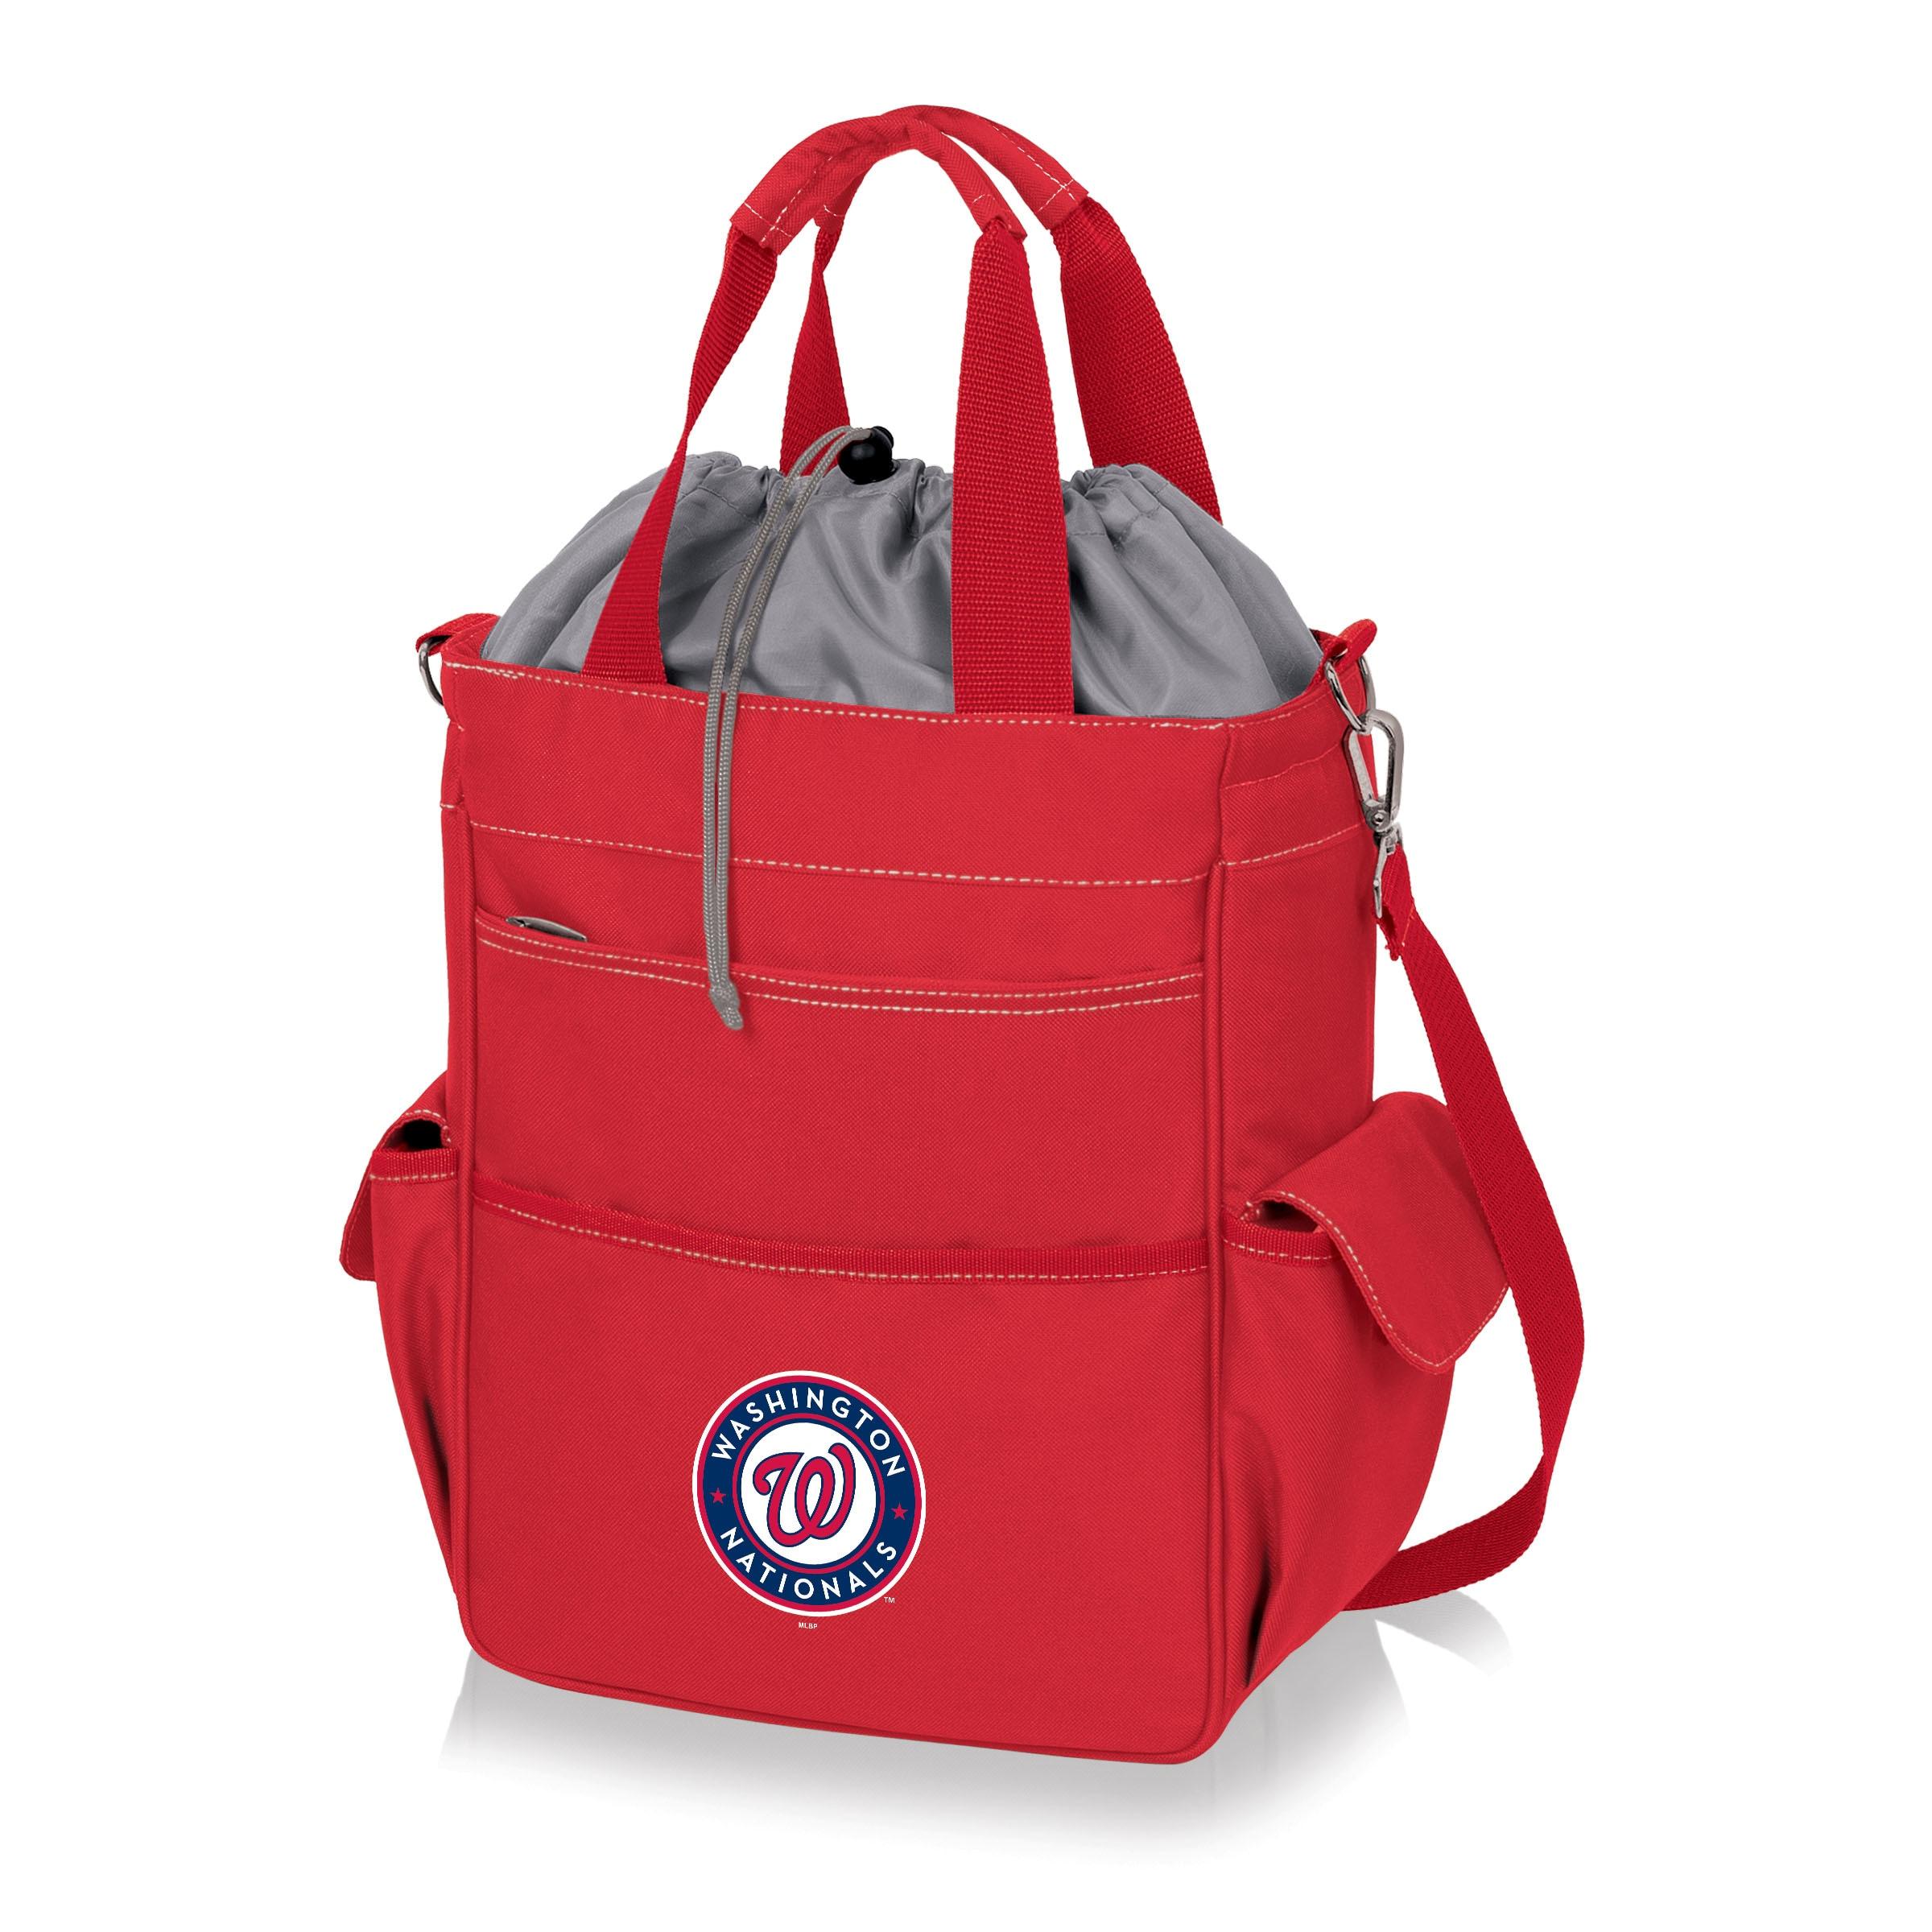 Washington Nationals Activo Cooler Tote - Red